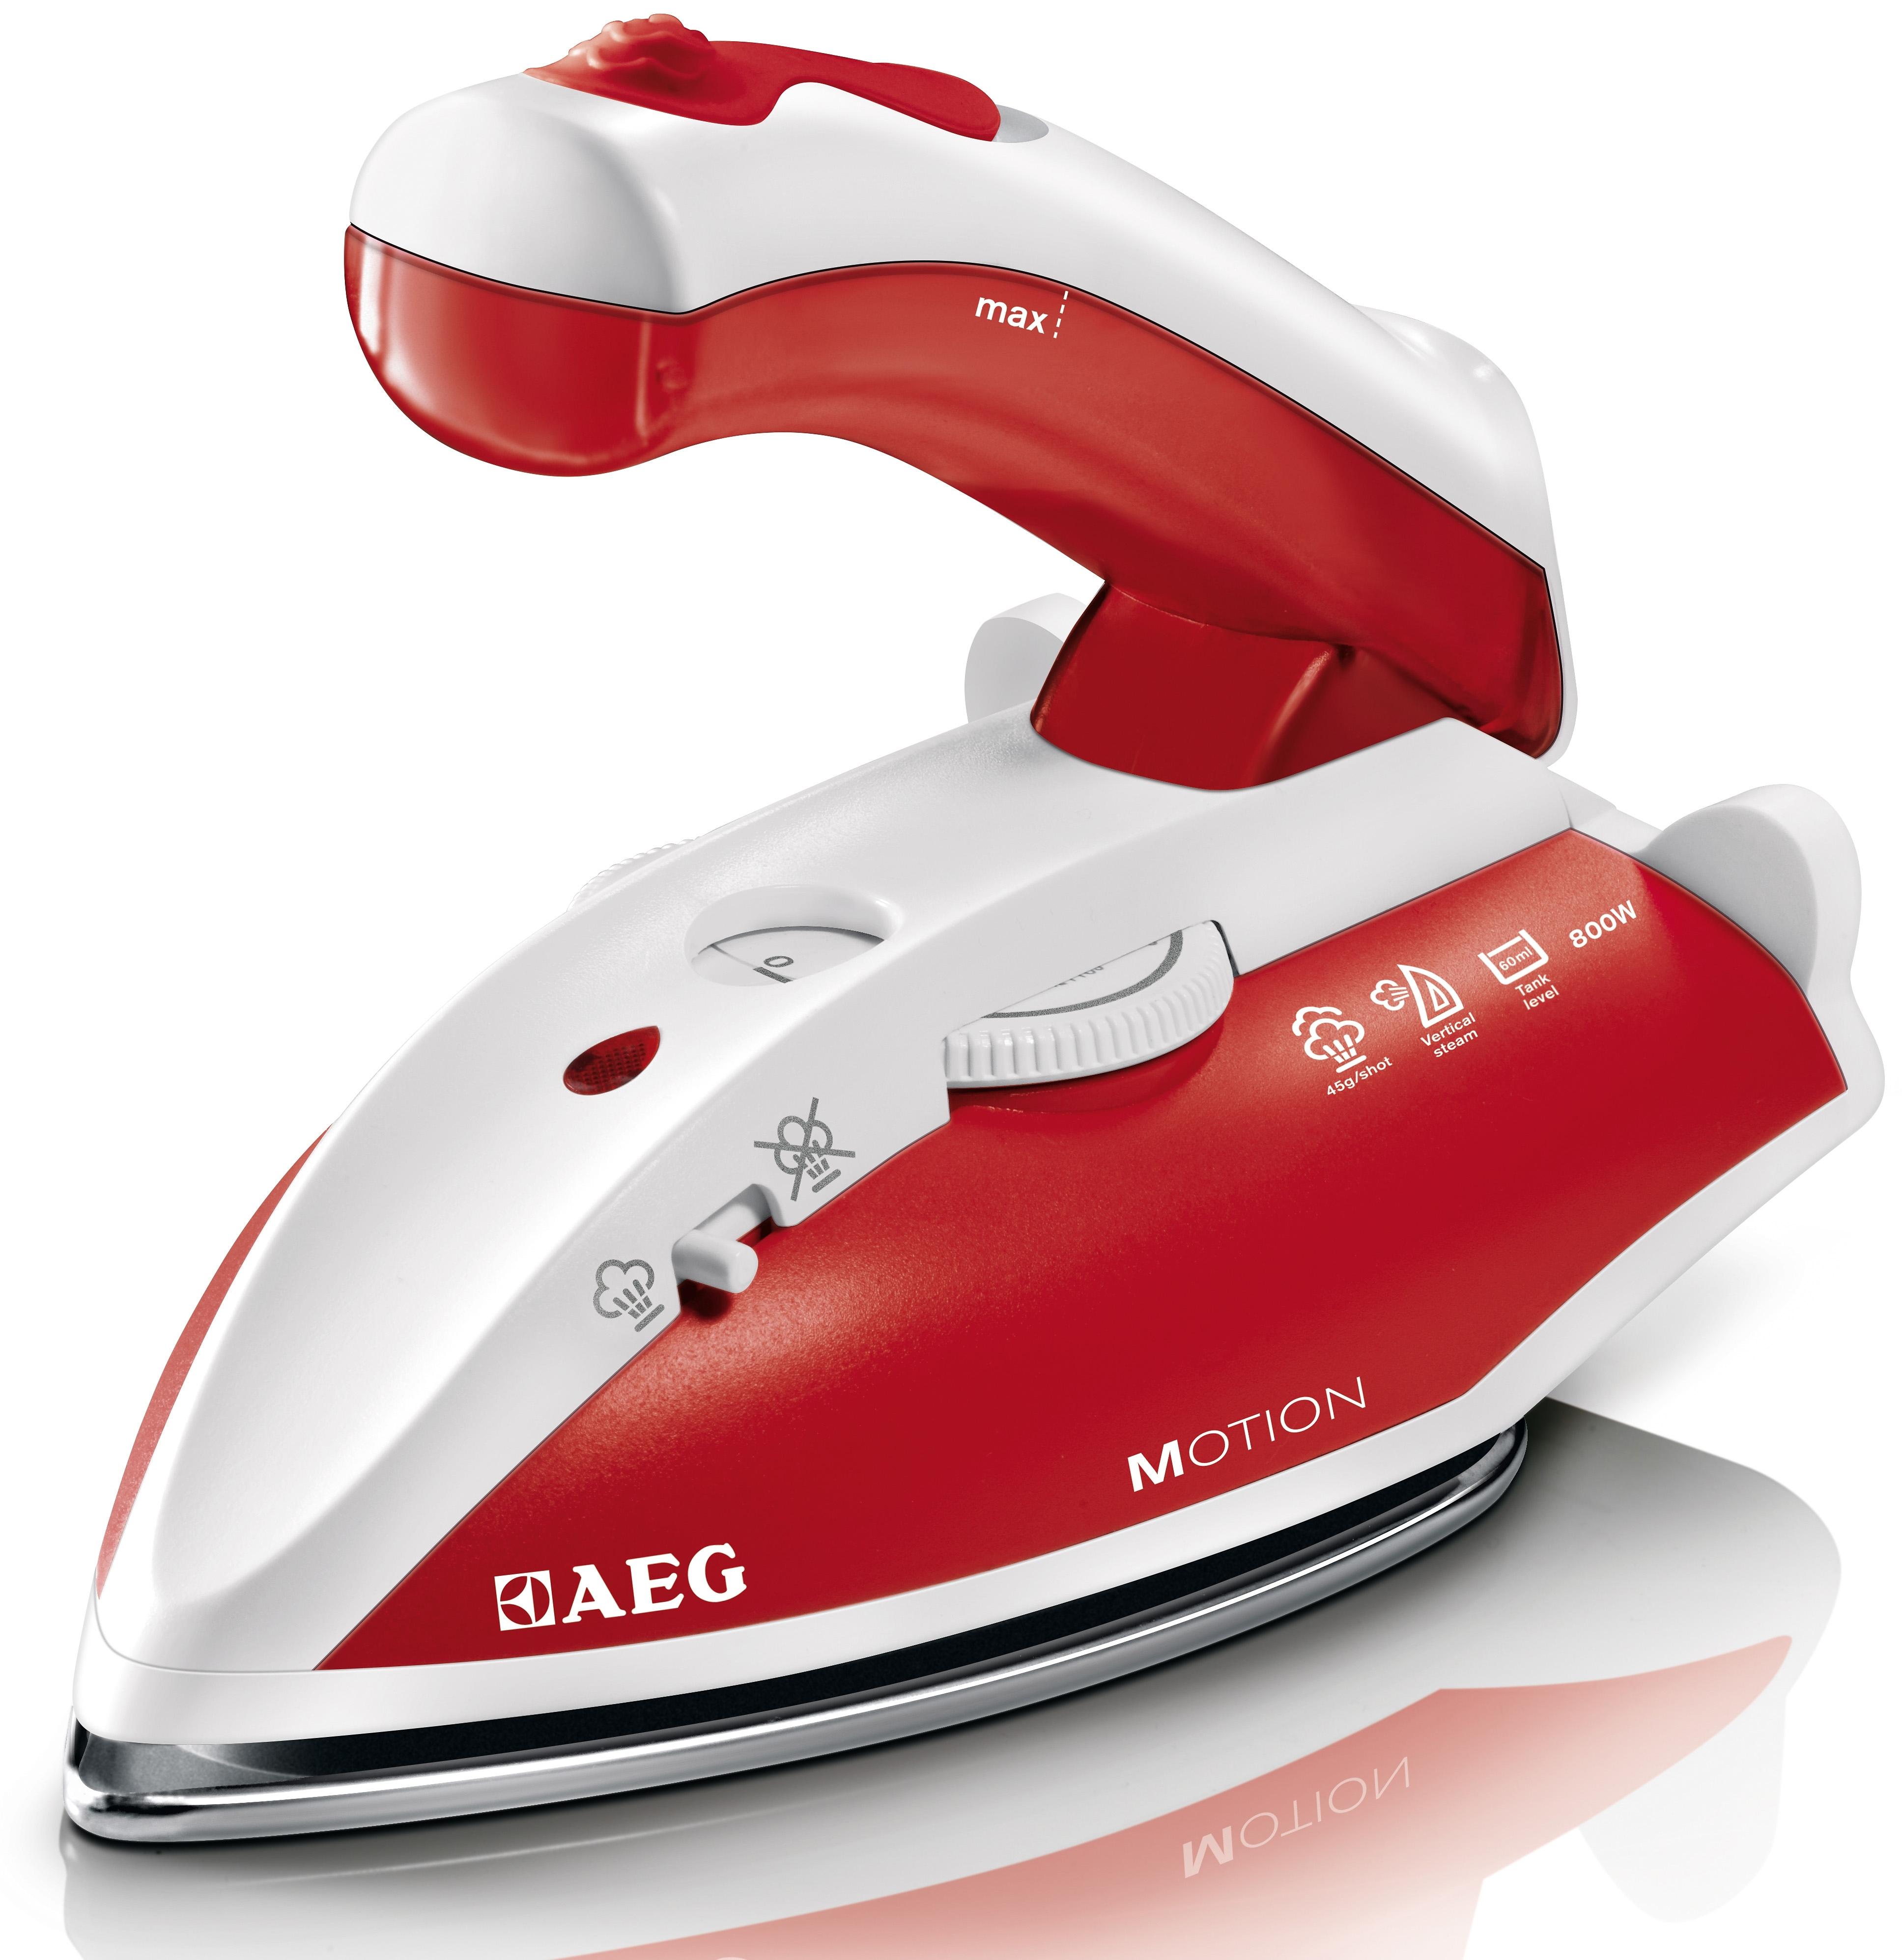 Hedendaags AEG Reis-strijkijzer DBT 800 snel online gekocht | OTTO JX-52